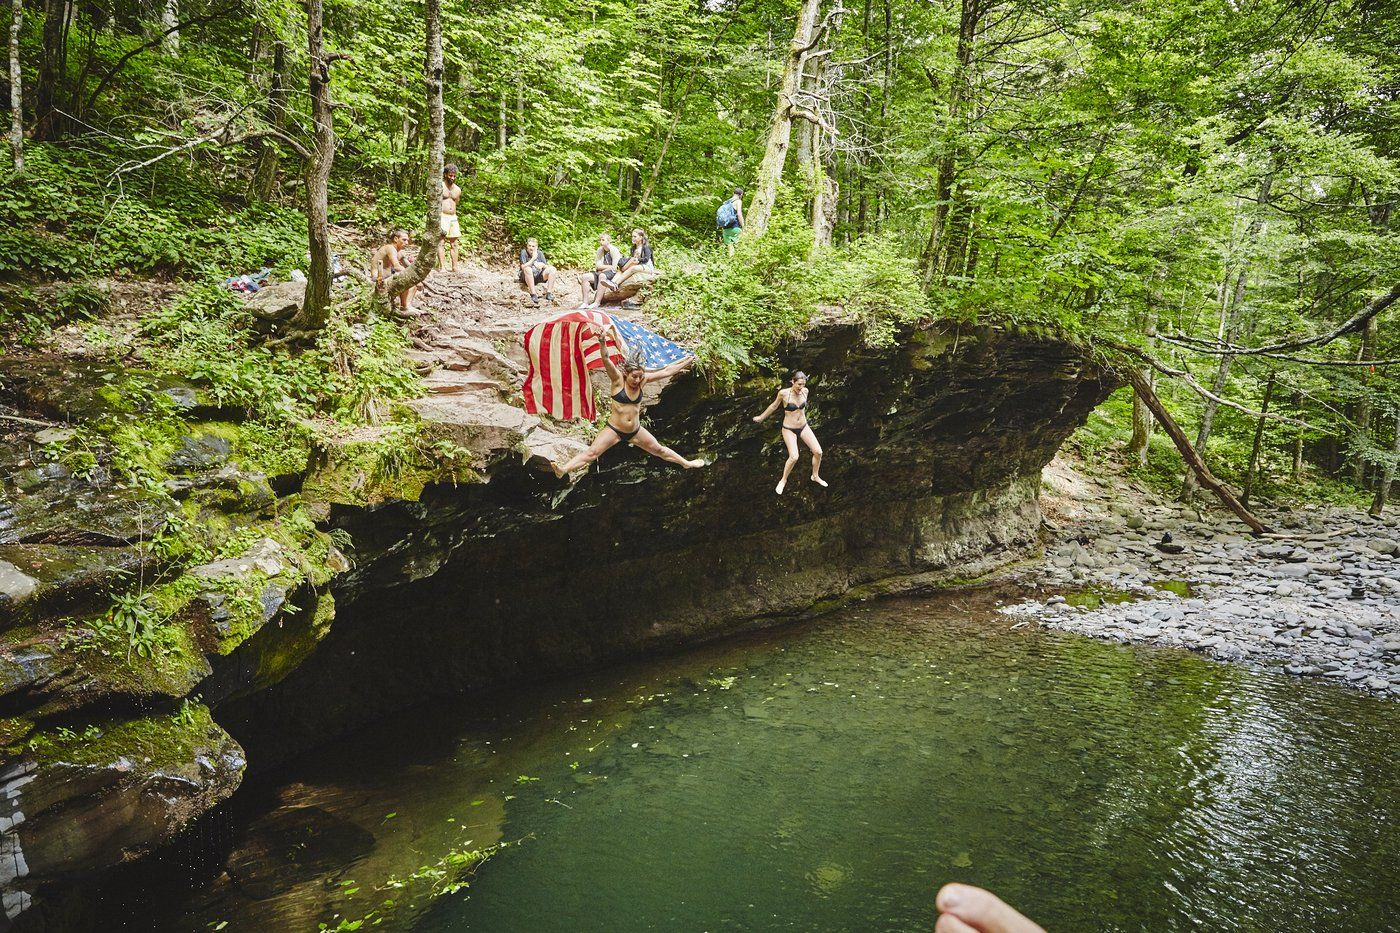 Best weekend getaways near NYC, accessible by public transportation